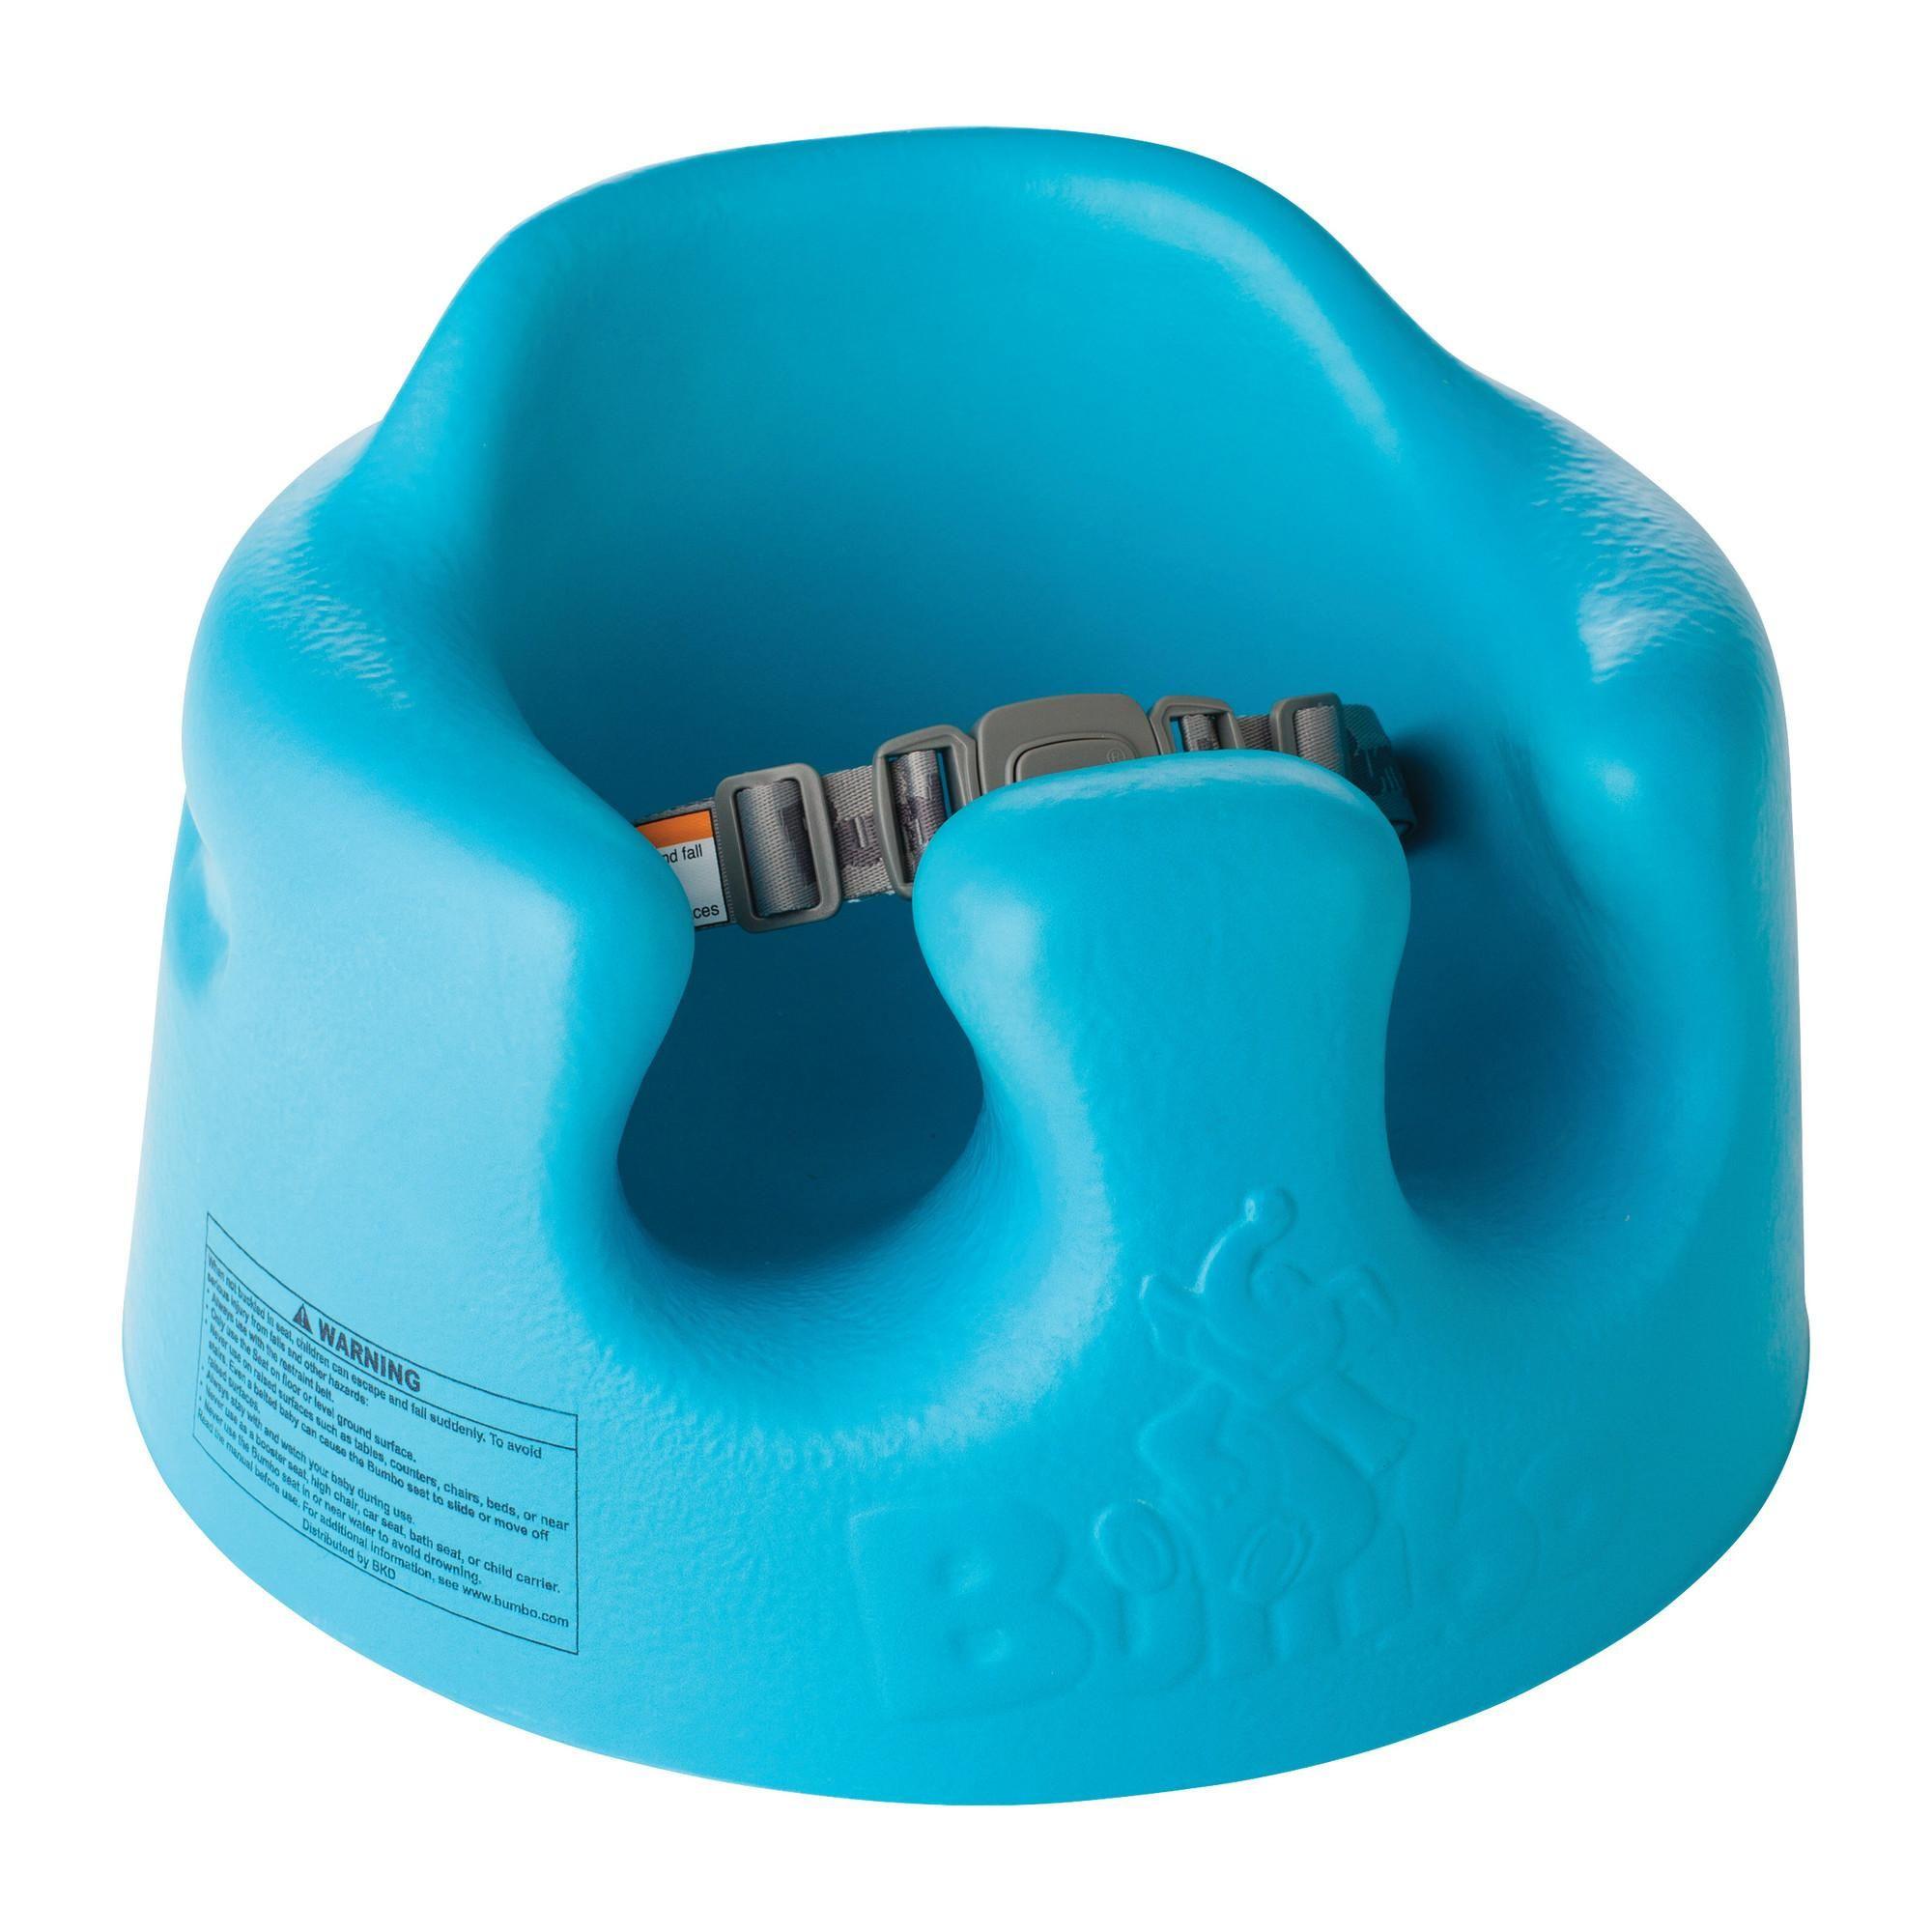 Amazon.com : Bumbo Floor Seat, Blue : Infant Sitting Chairs : Baby ...